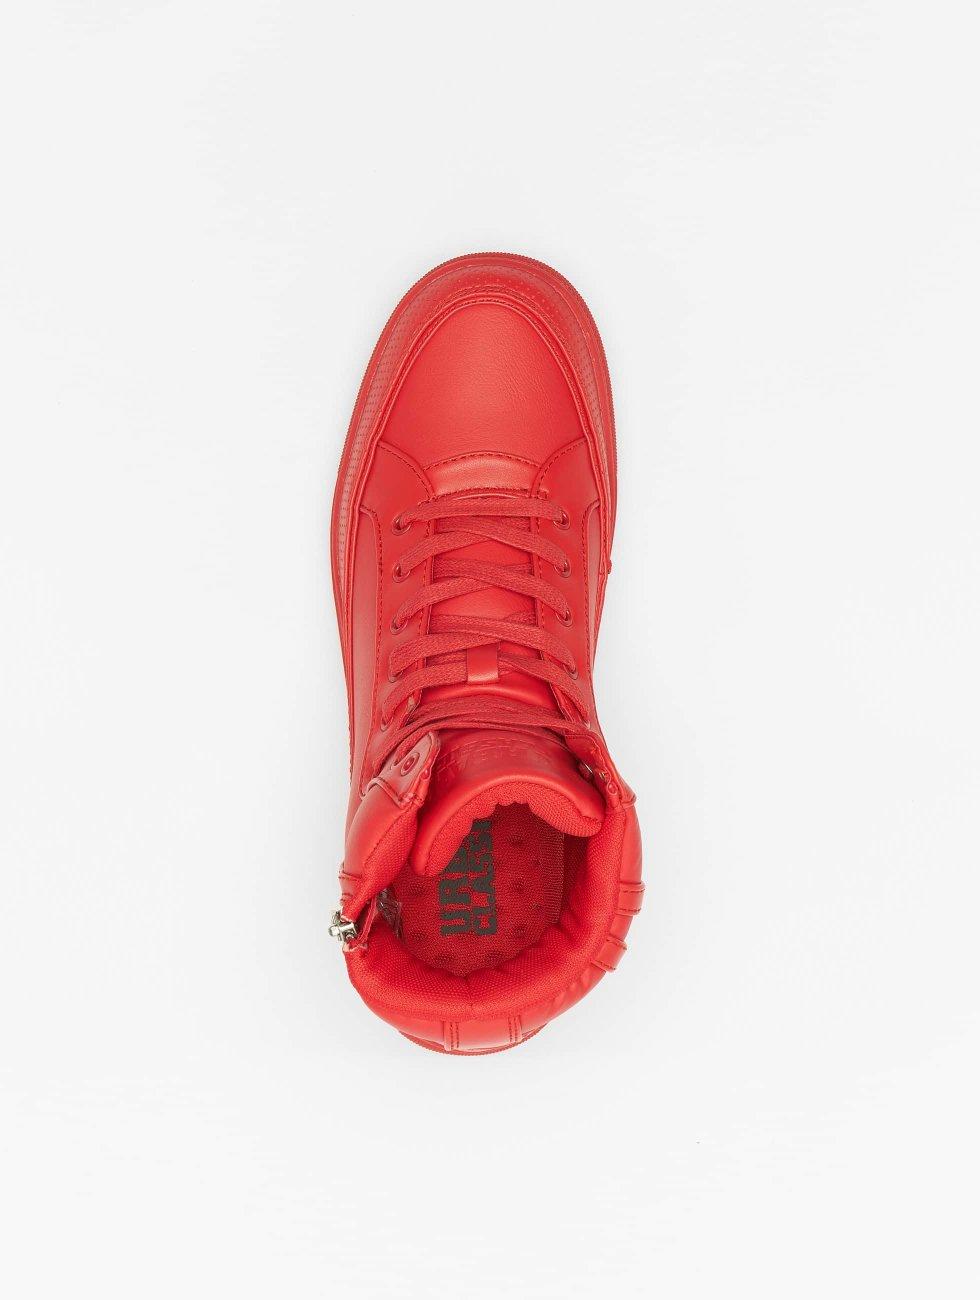 Classici Urbani Schoen / Sneaker Cerniera Rood 263.790 bSnKOx